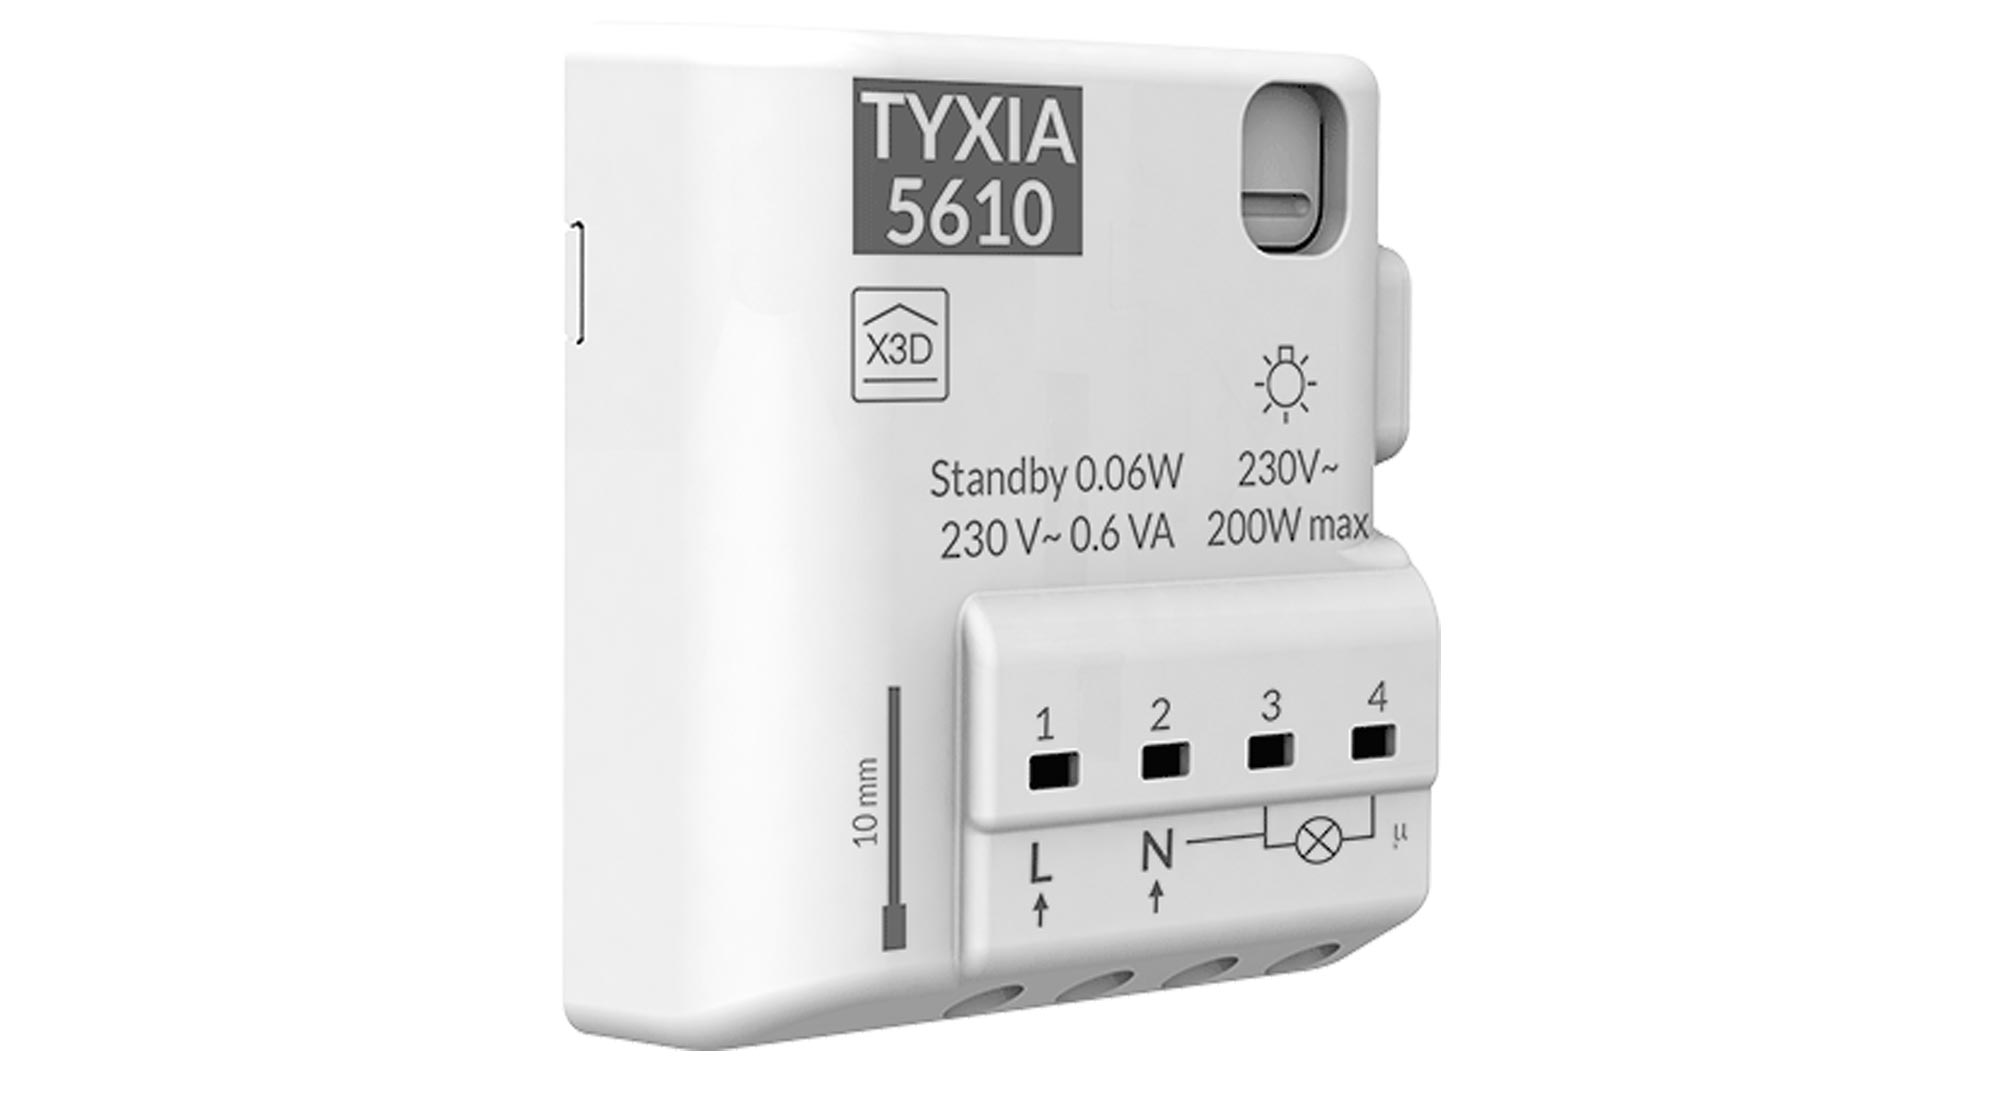 module-tyxia-5610-611-eclairage-vas-et-vient